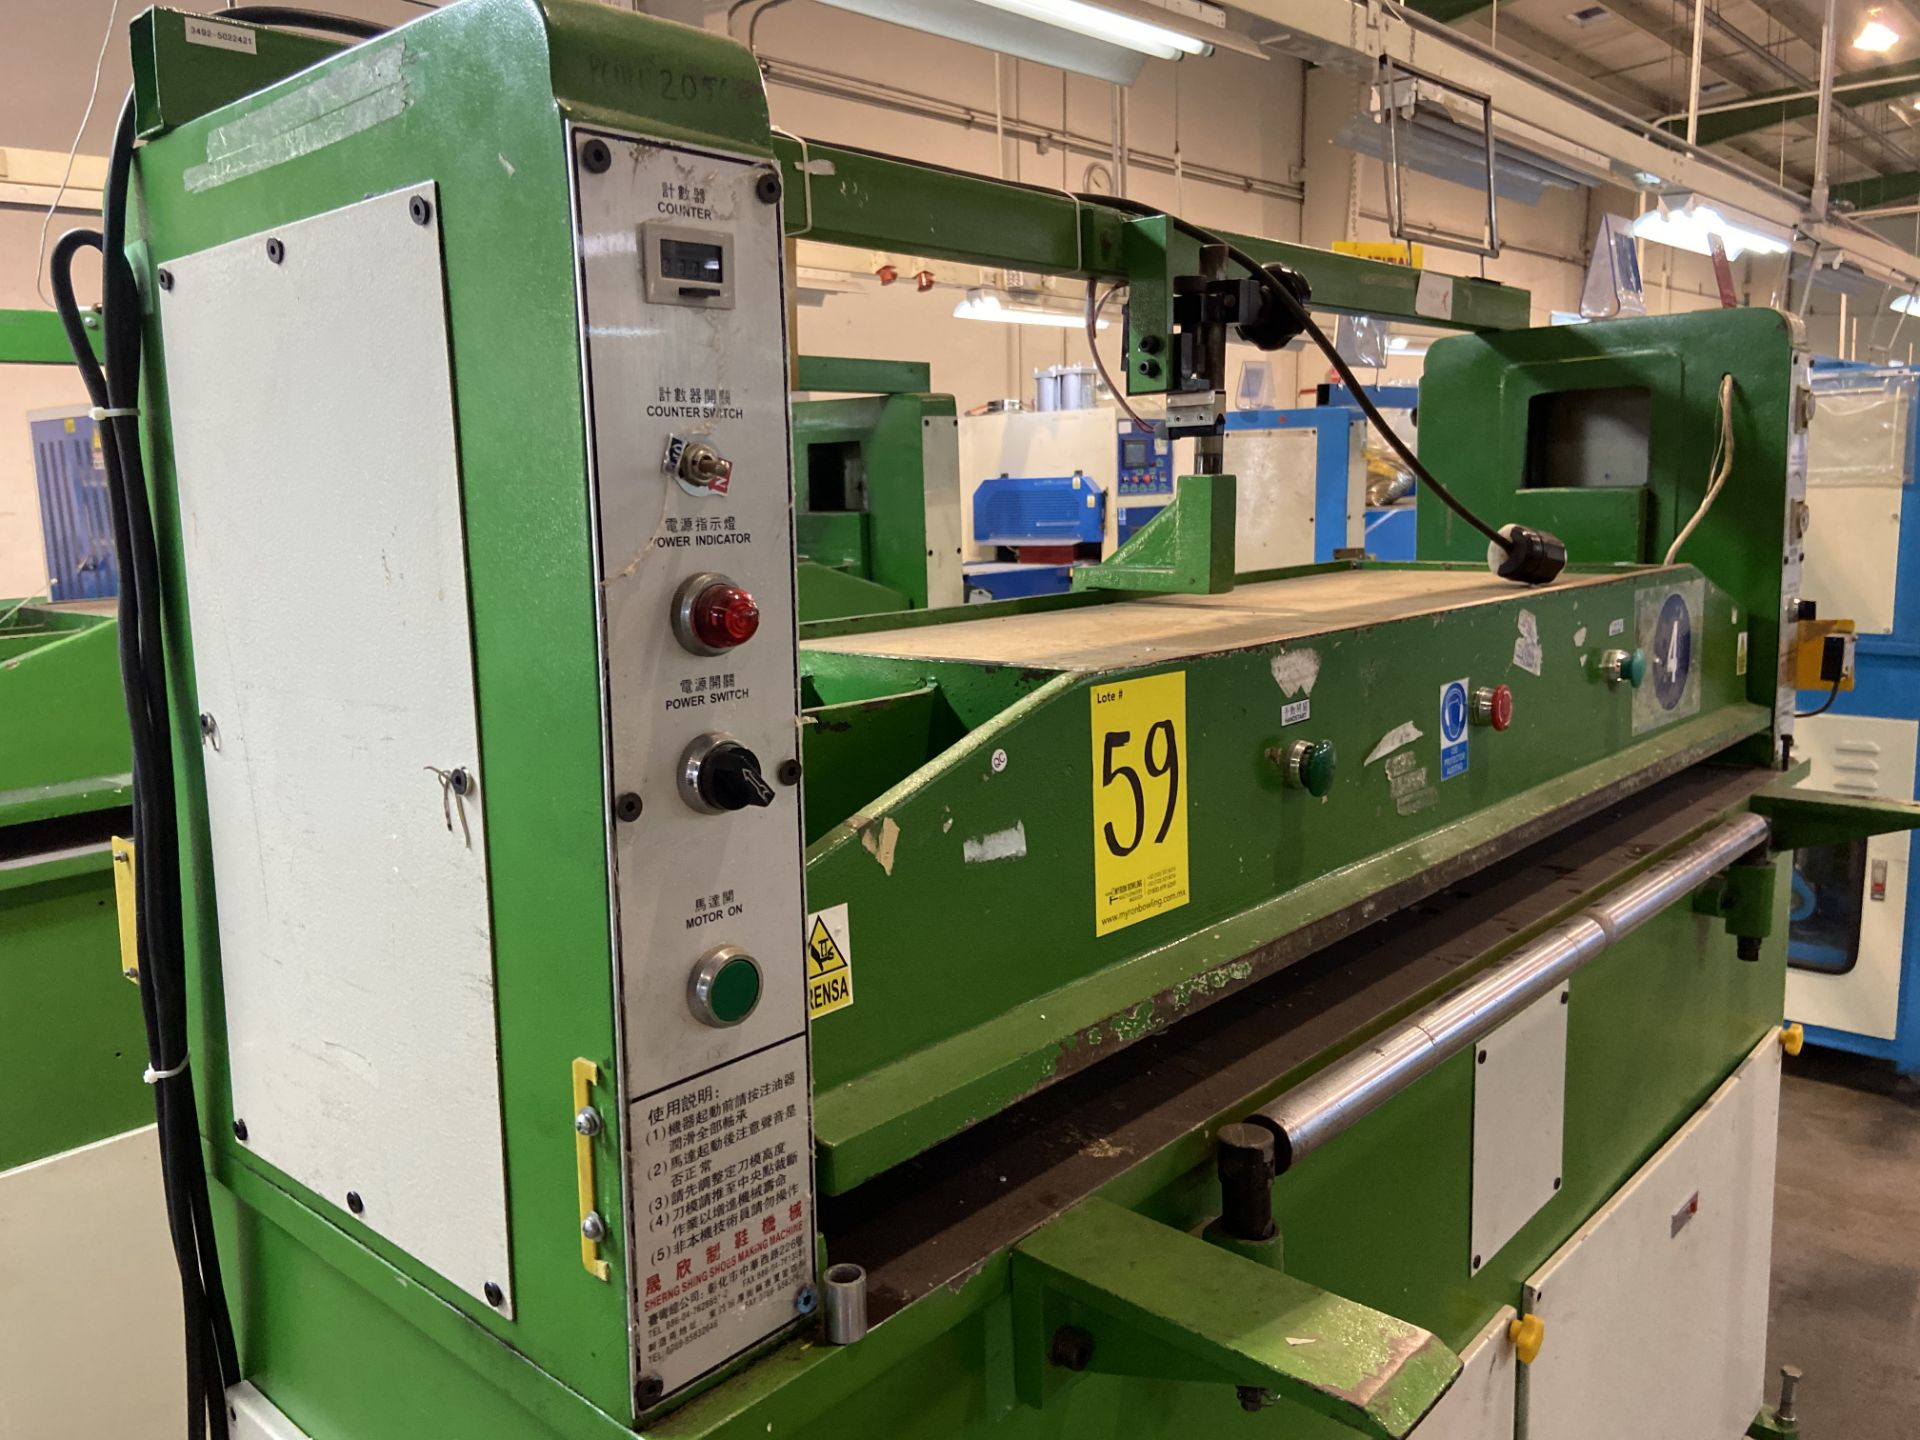 Lot 59 - (2) Prensas de corte hidráulica plana, marca Hydraulic Cutting Machine, Modelo: CH-727A